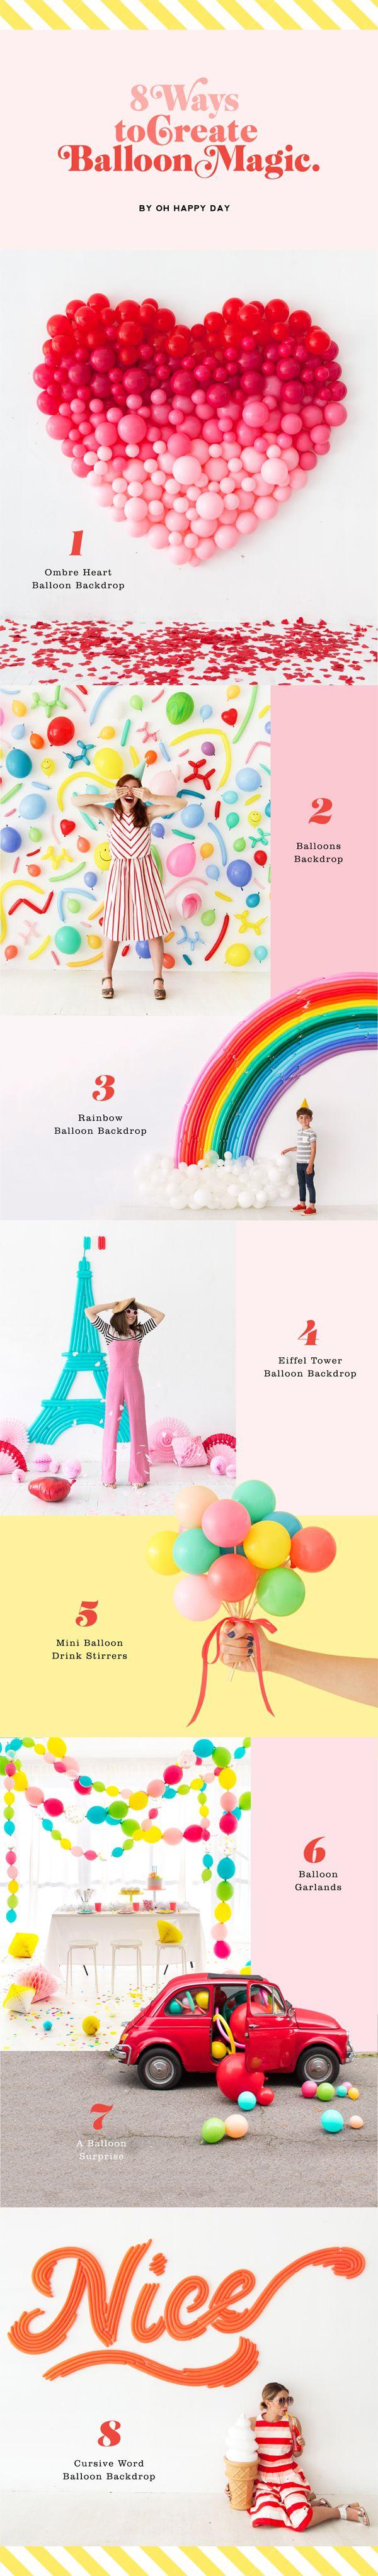 8 Ways to Create Balloon Magic (Oh Happy Day!)